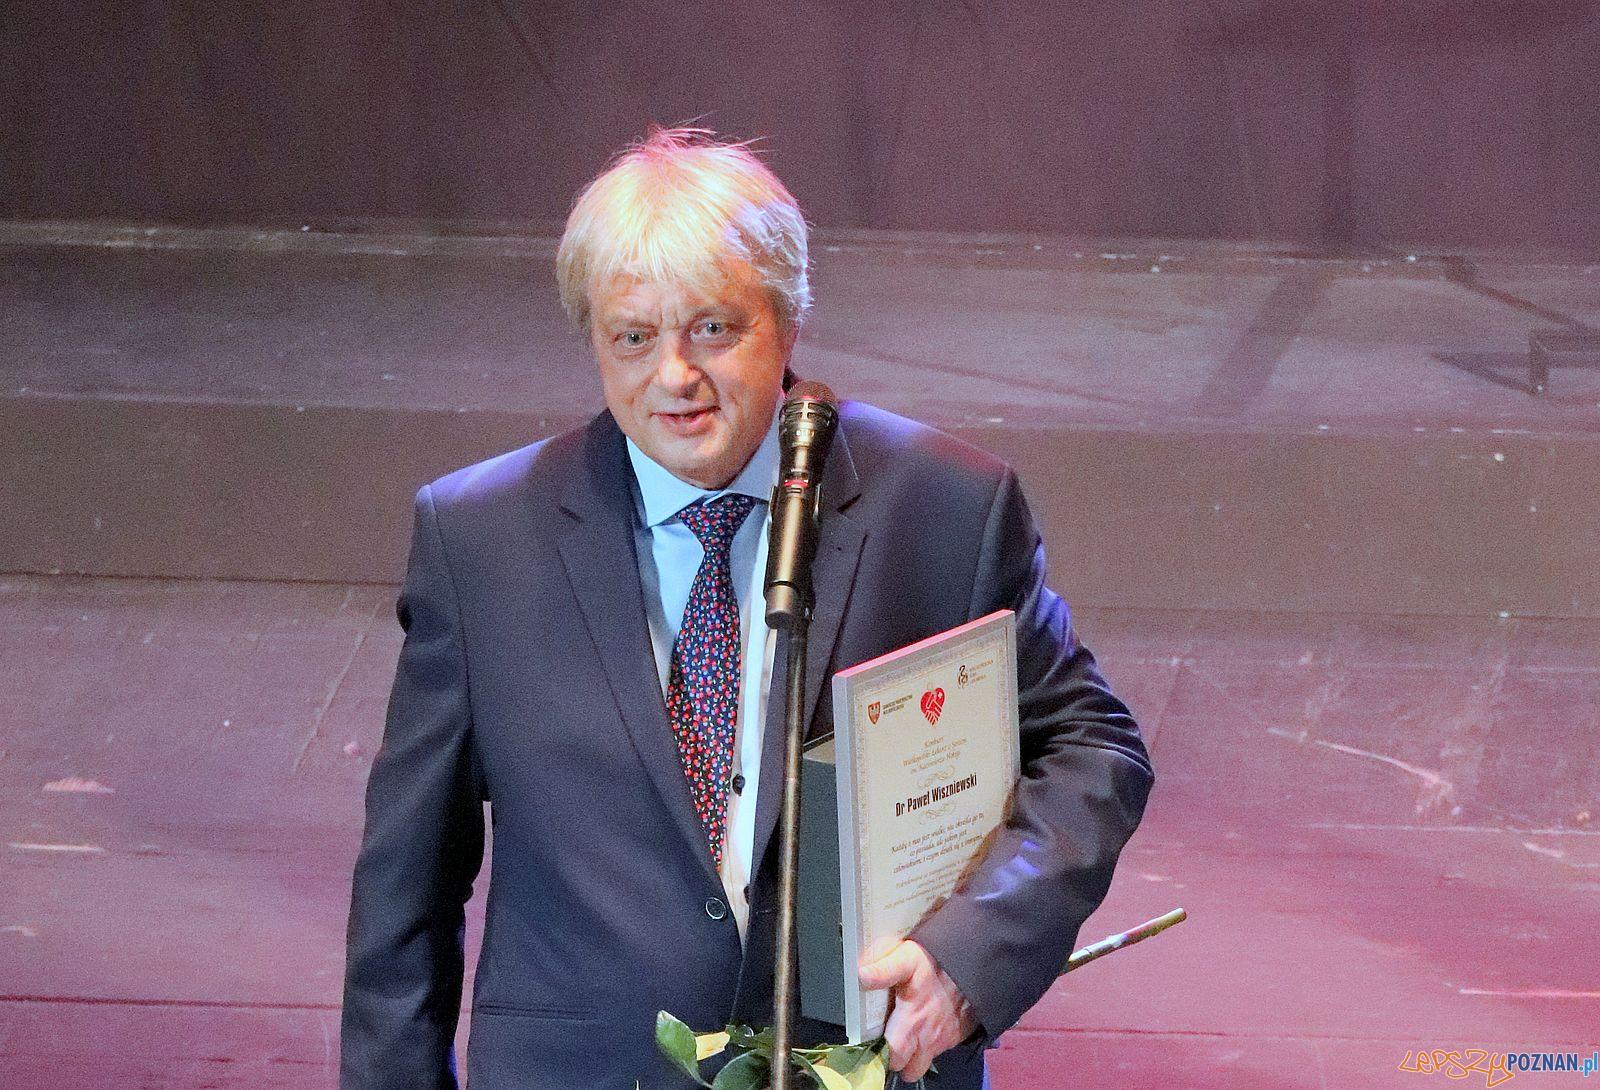 Wielkopolski Lekarz z Sercem 2019  Foto: KM / Wielkopolska Izba Lekarska